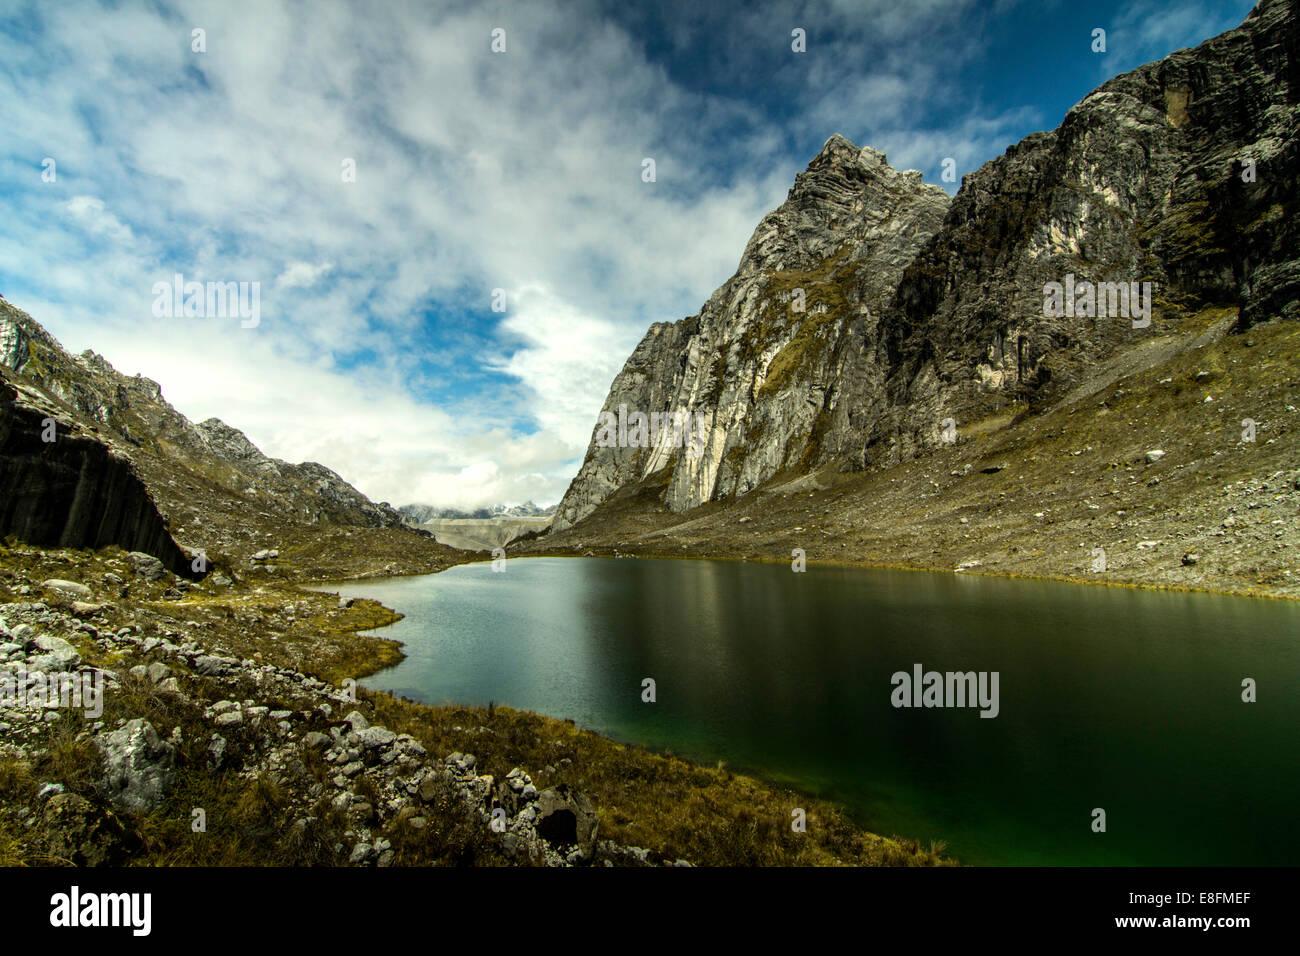 Indonesia, Papua, Lorents Jayawijaya, Parque Nacional de Conservación, Vista de Meren East Lake Imagen De Stock